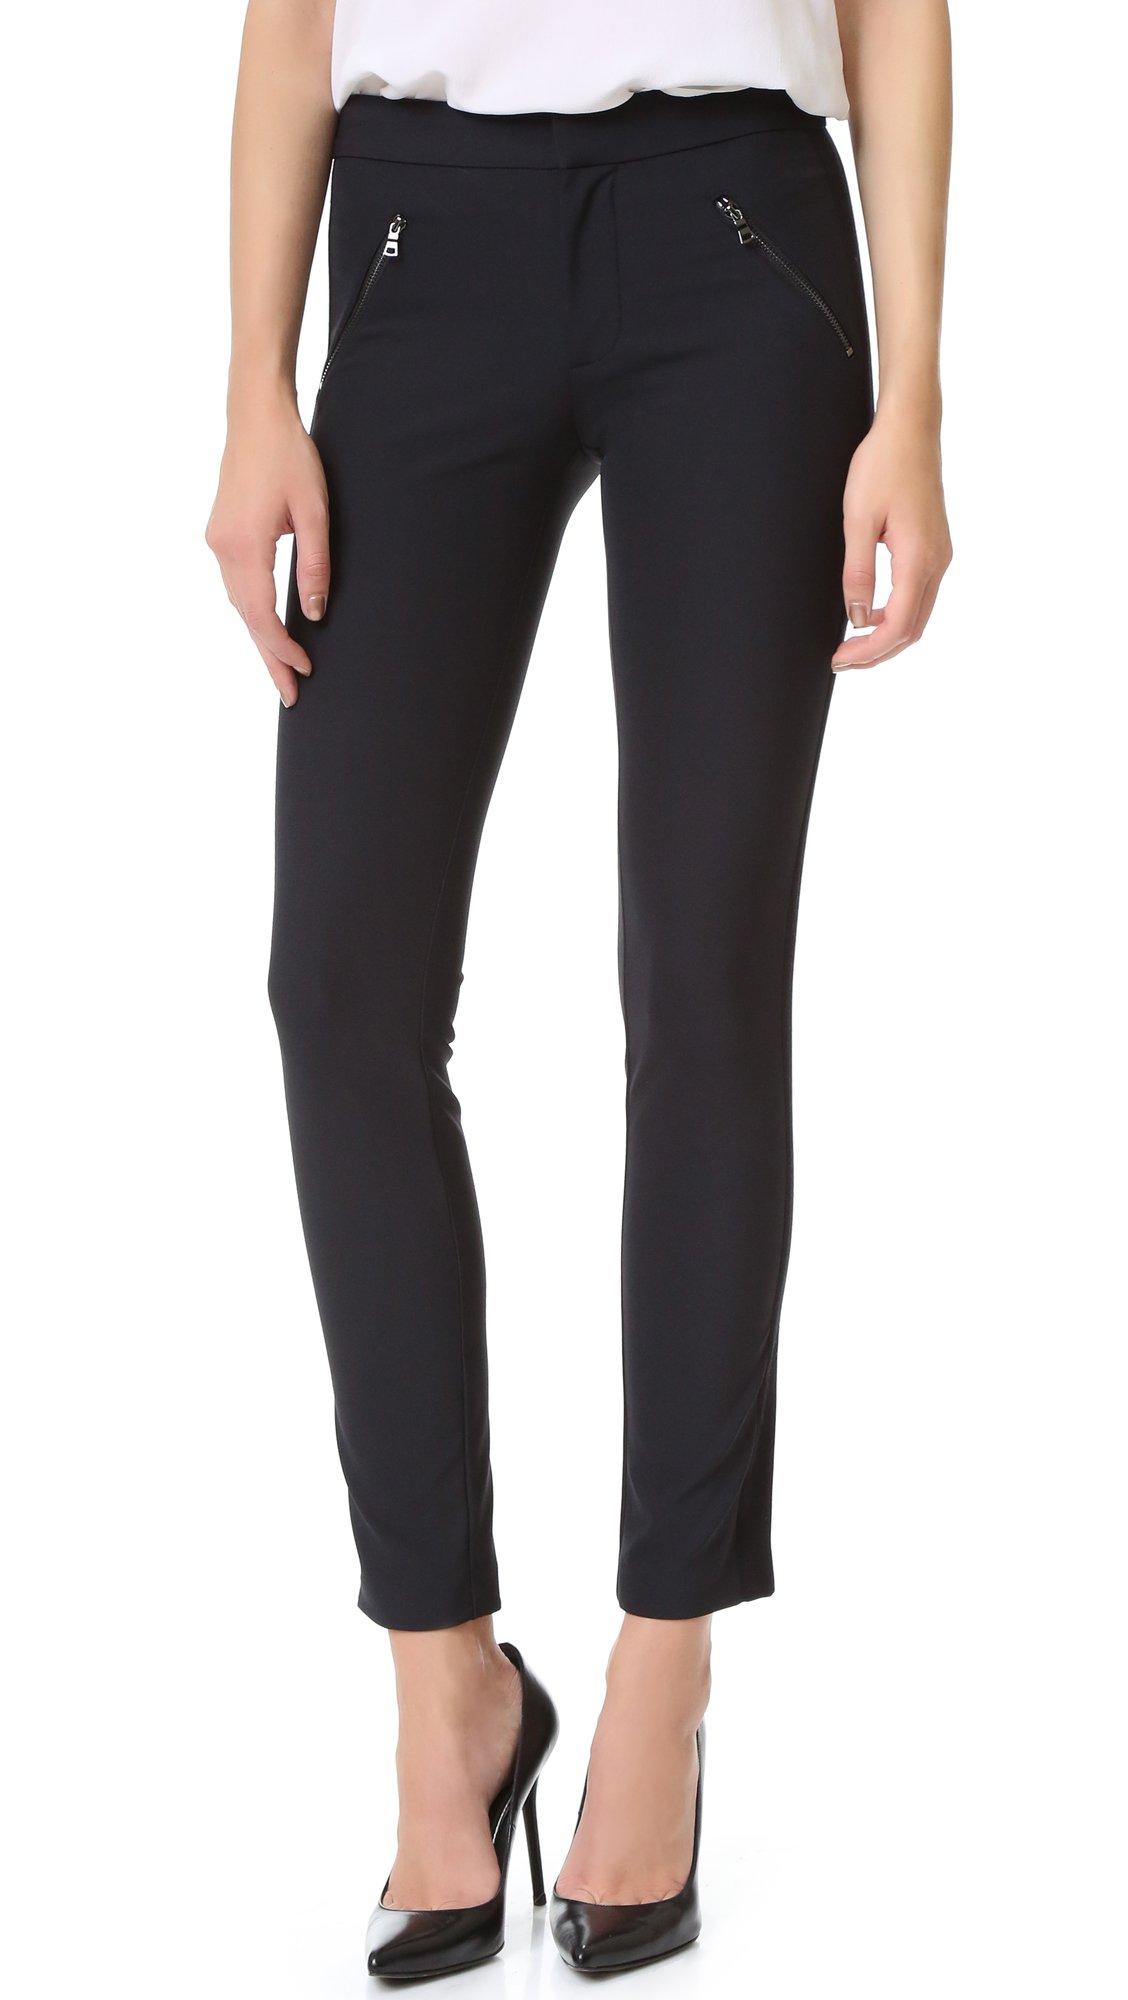 Rebecca Taylor Women's Ava Techy Slim Pant, Black, 12